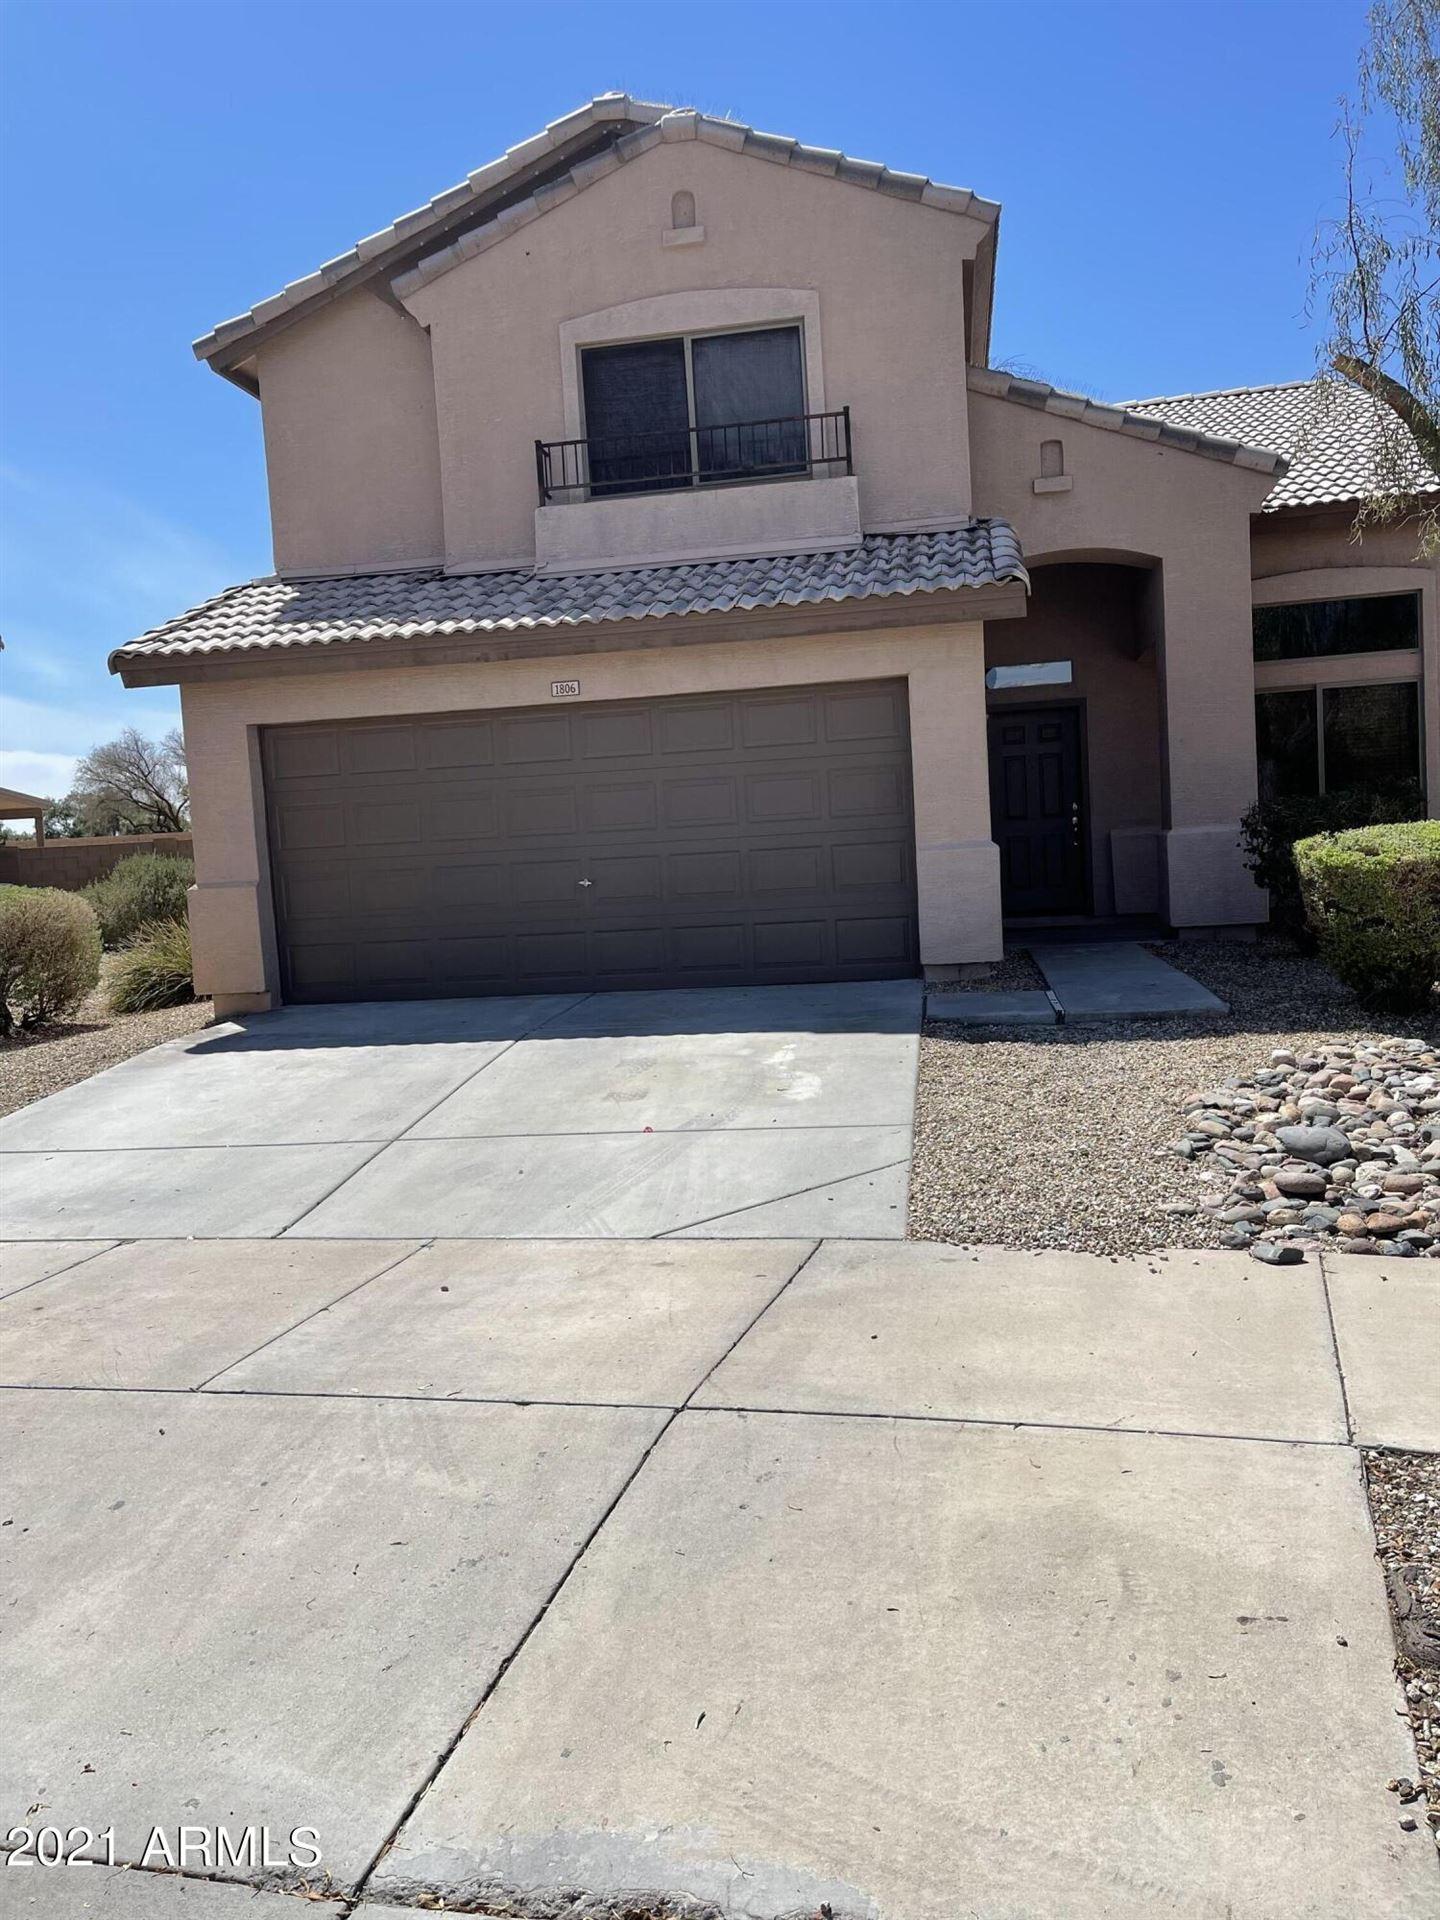 Photo of 1806 S 172ND Lane, Goodyear, AZ 85338 (MLS # 6249169)